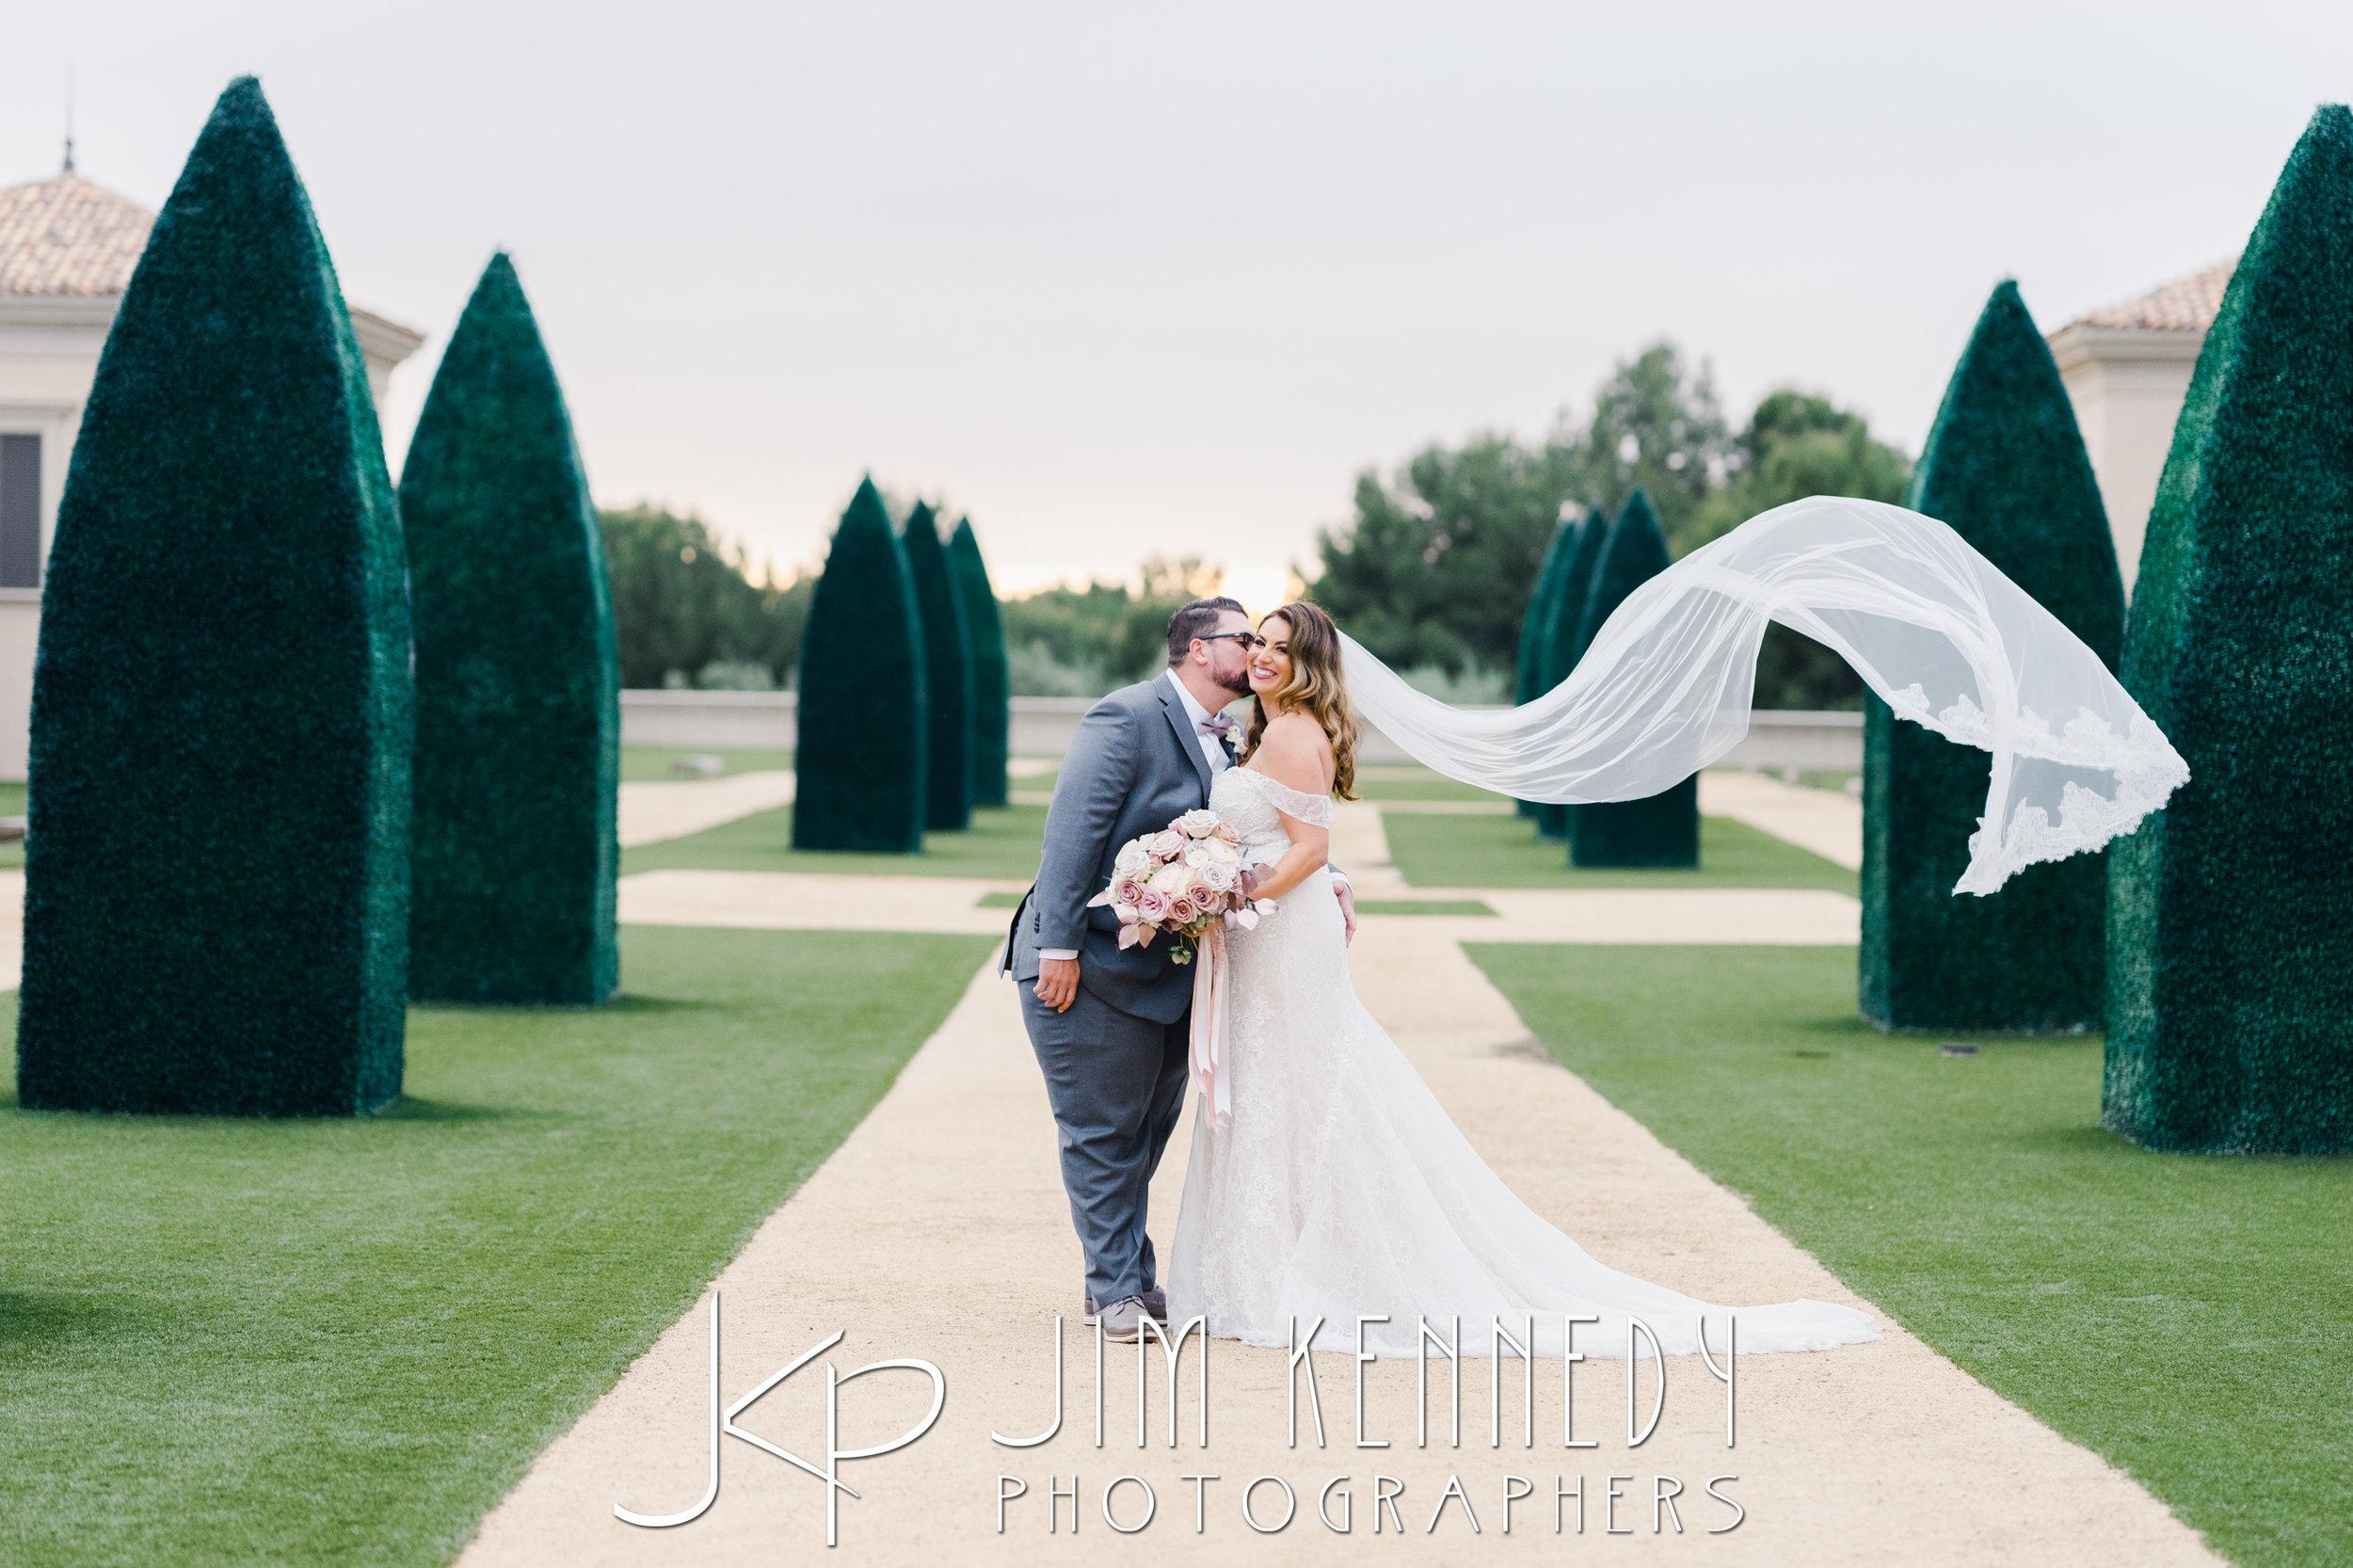 pelican-hill-wedding-jim-kenedy-photographers_0170.JPG